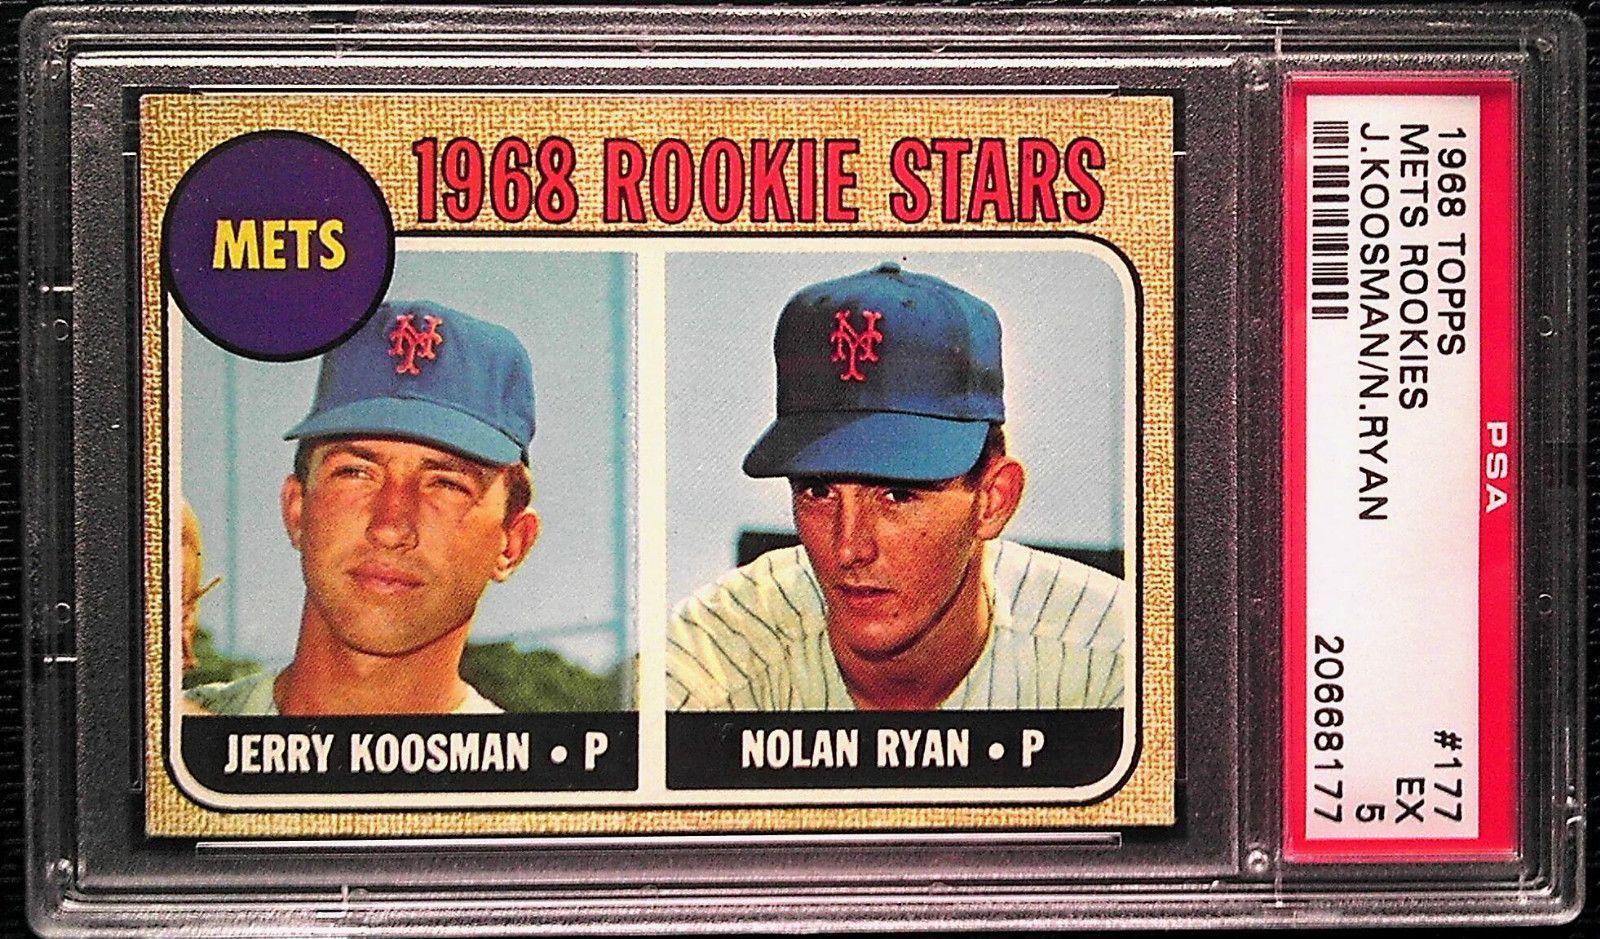 1974 topps baseball cards worth money